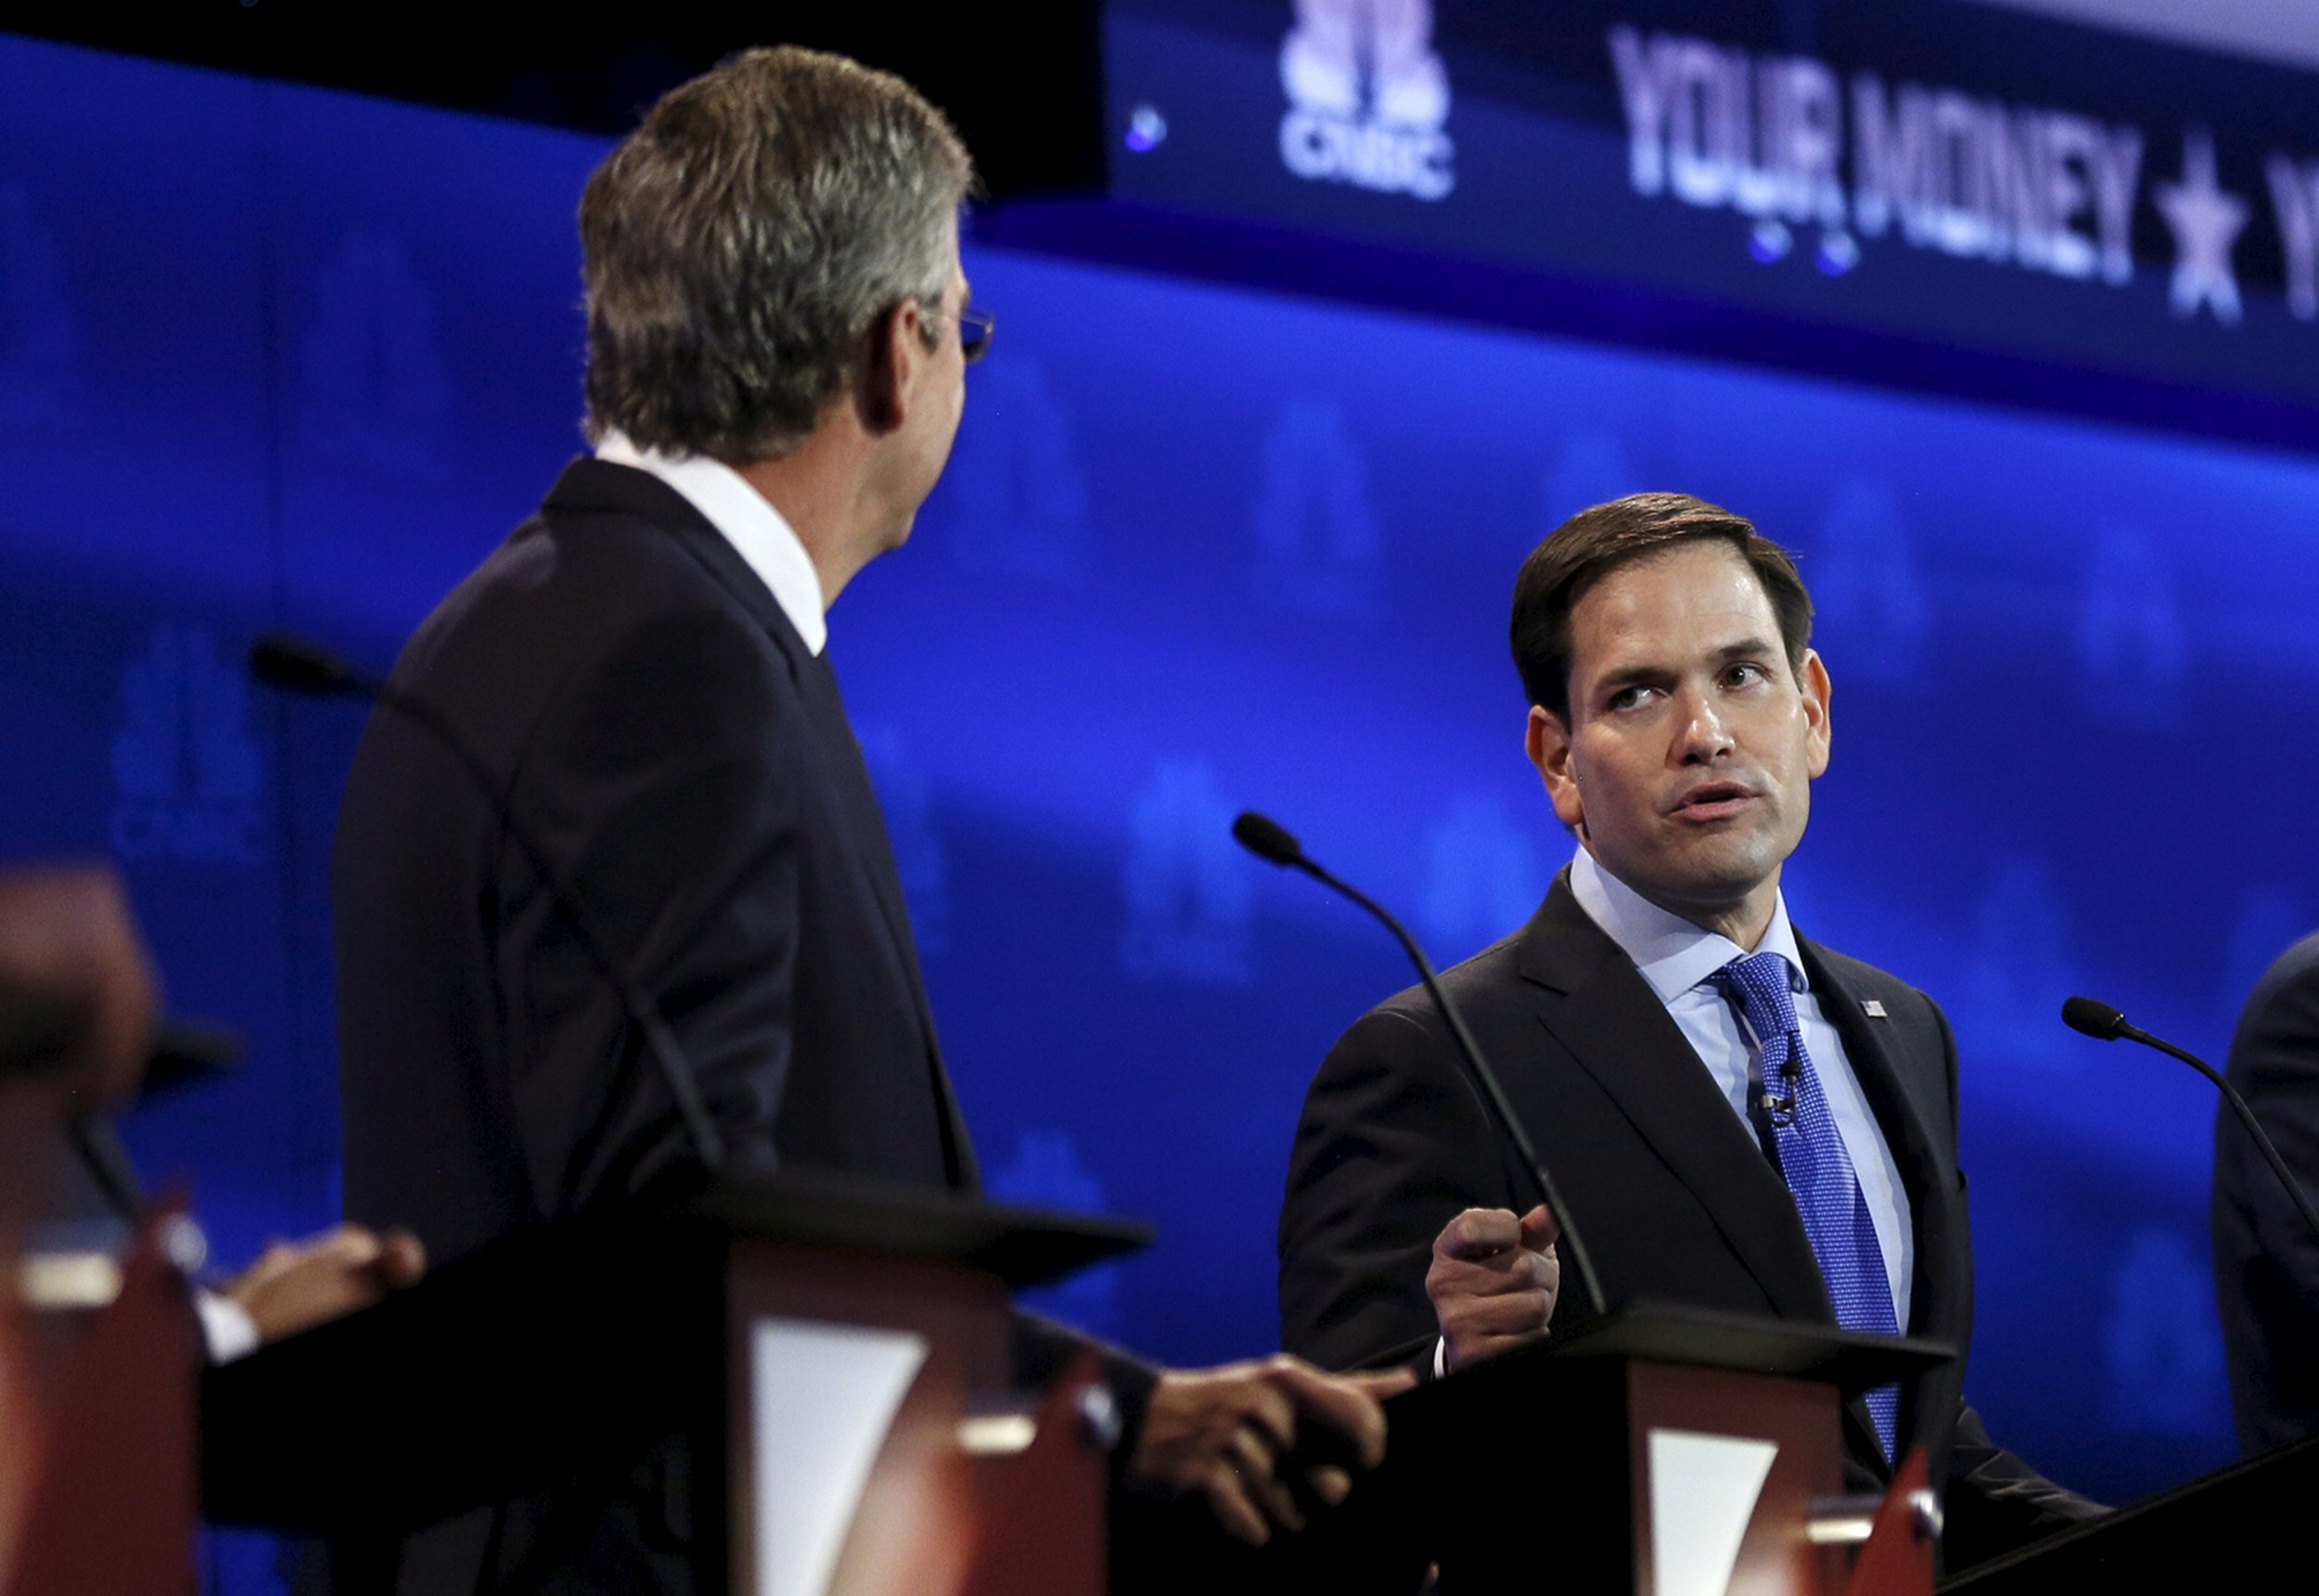 11_10_Rubio_DebateMiddleClass